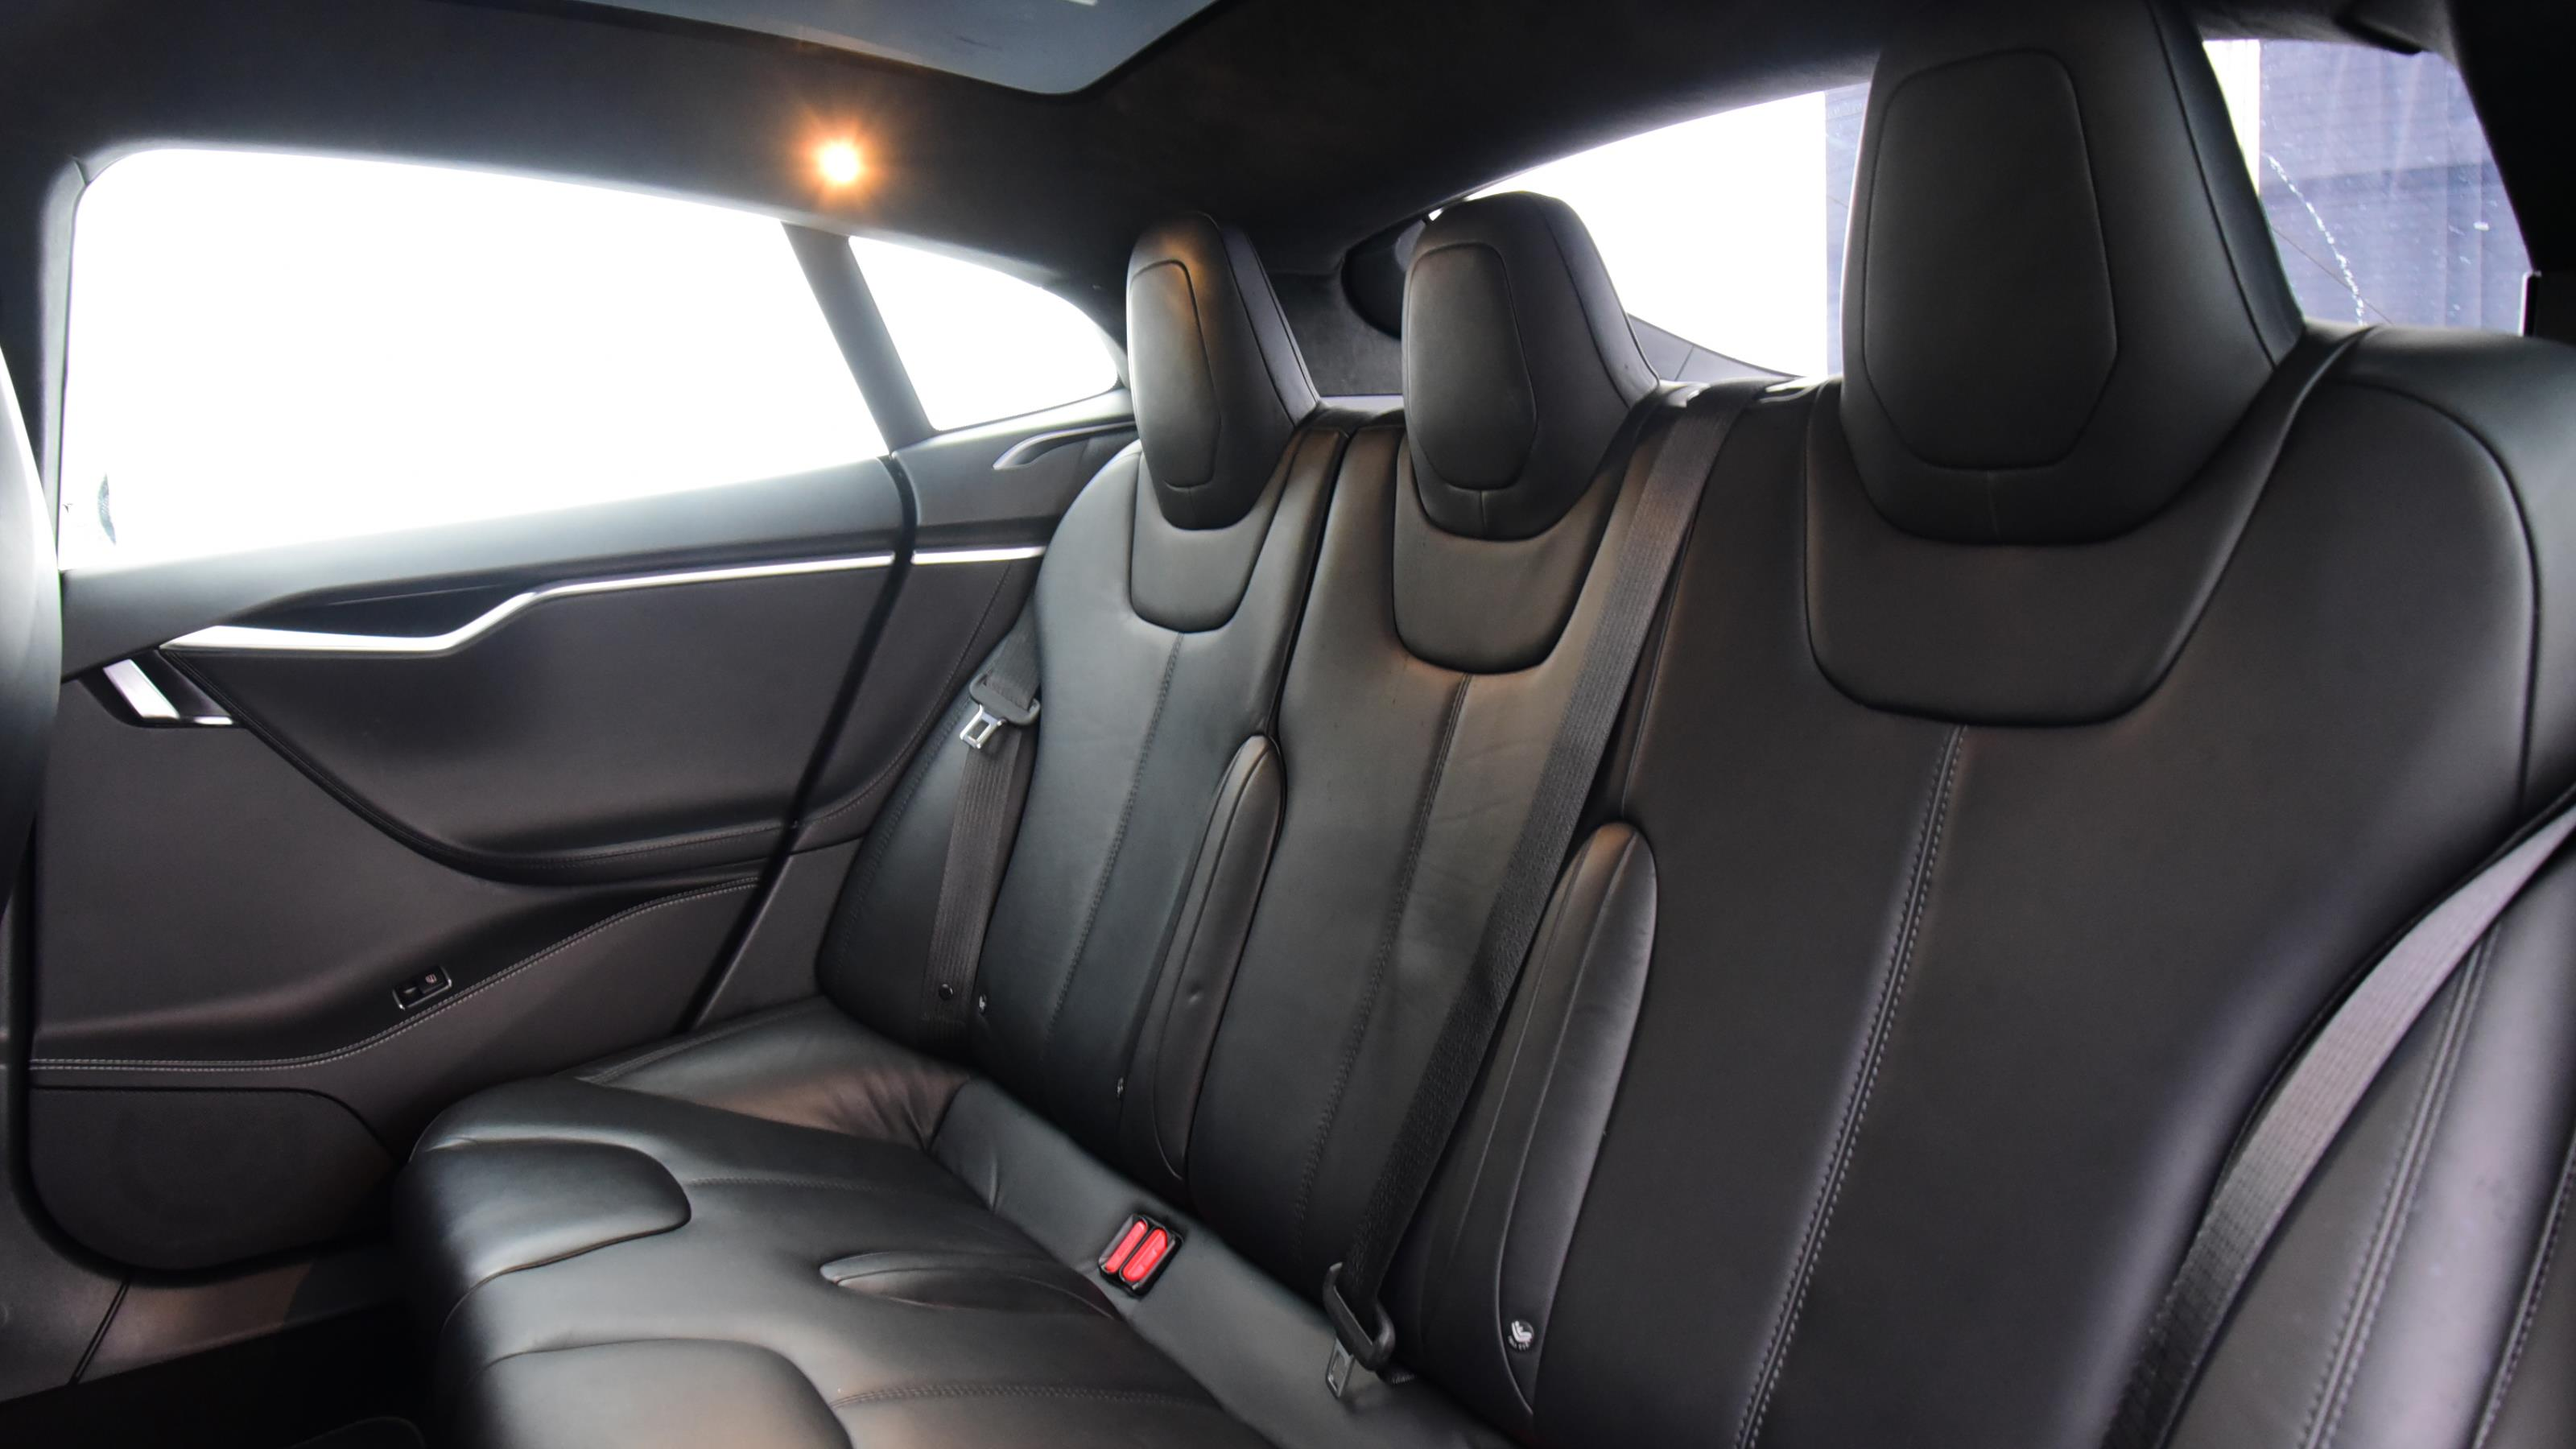 Used 2017 Tesla MODEL S 449kW 100kWh Dual Motor 5dr Auto WHITE at Saxton4x4